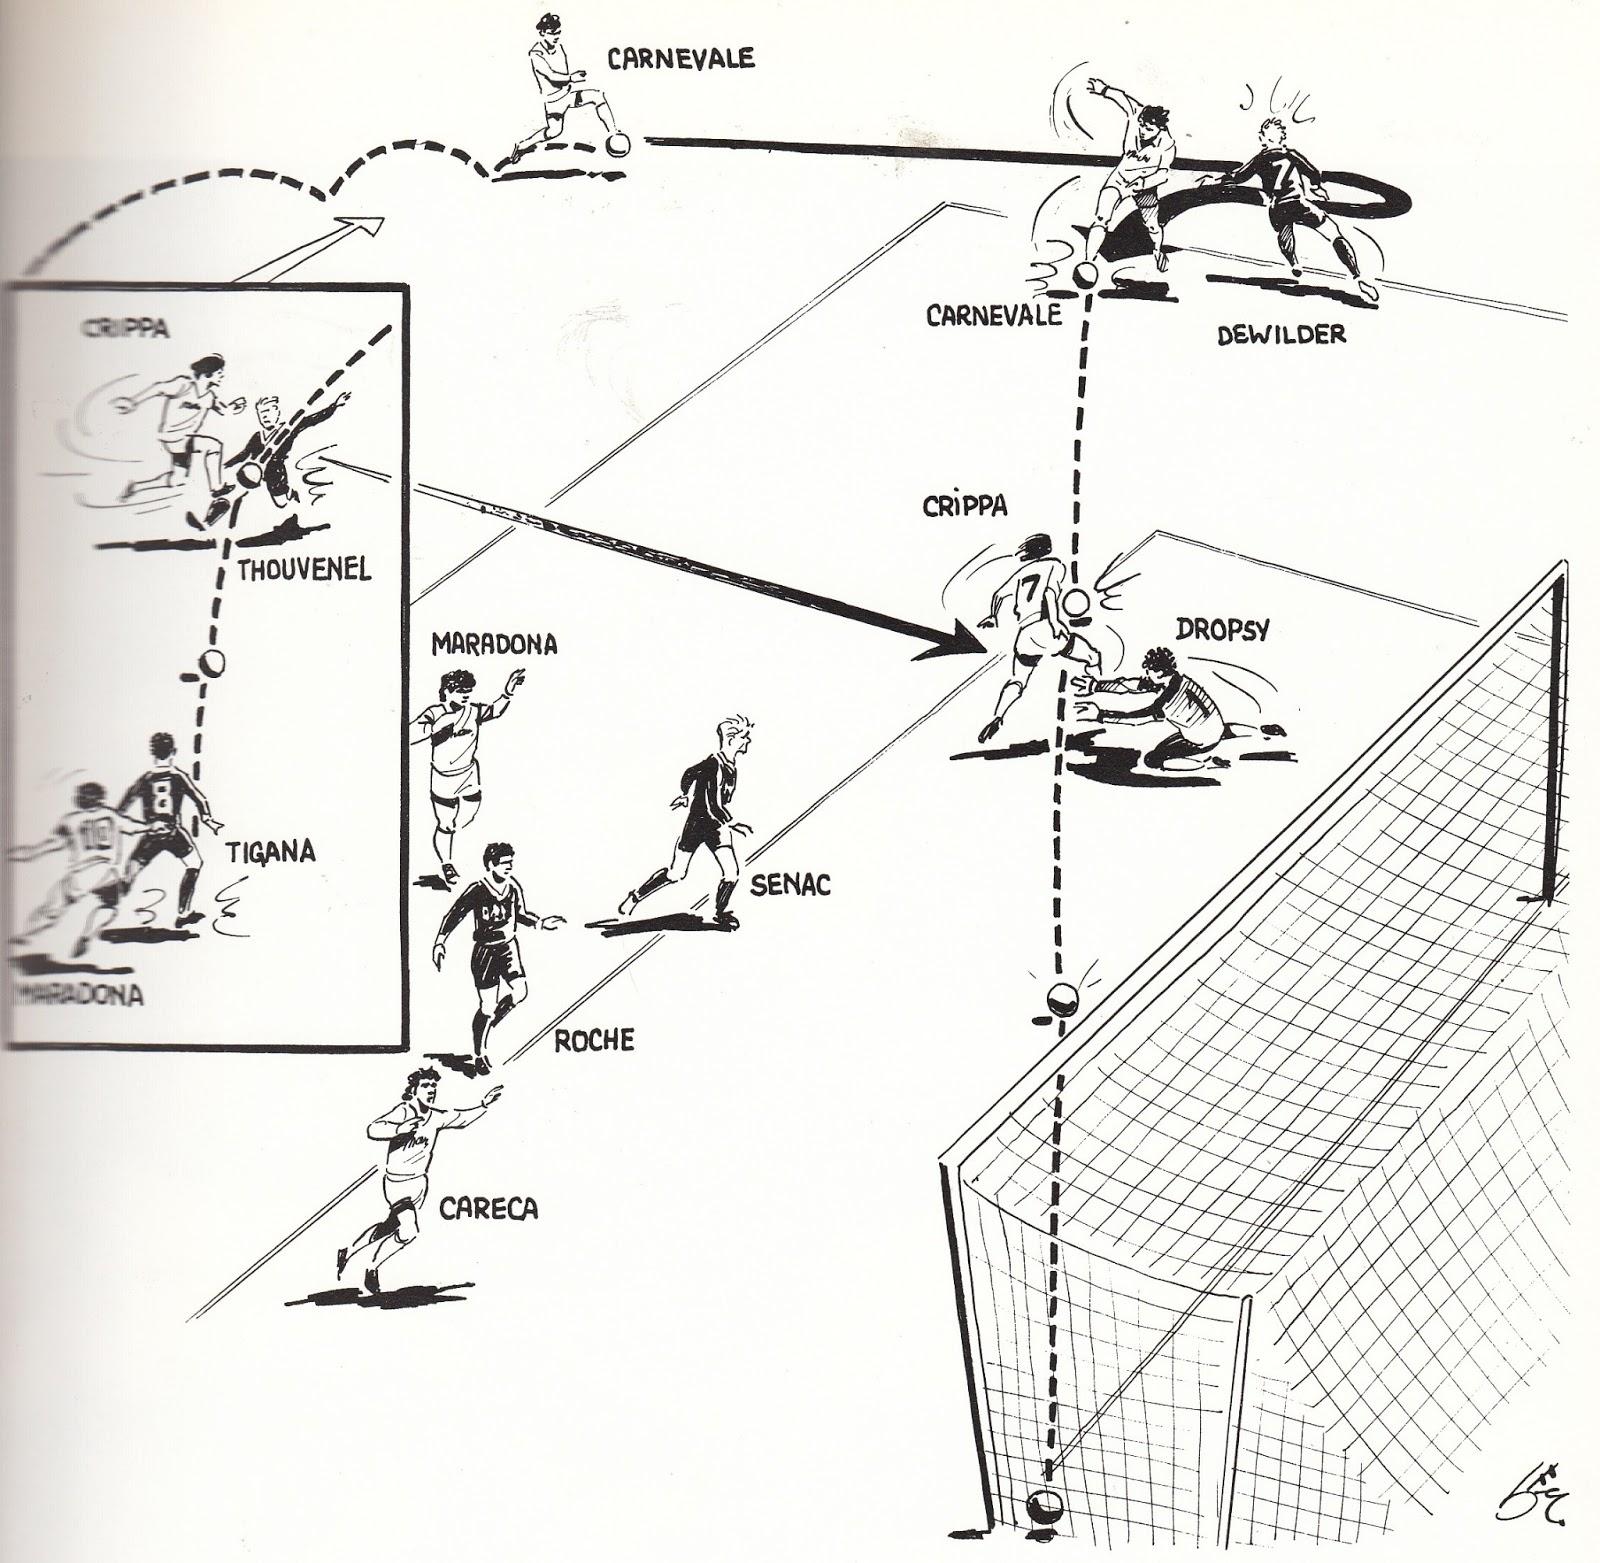 Soccer Nostalgia Old Match Photographs Part 13e